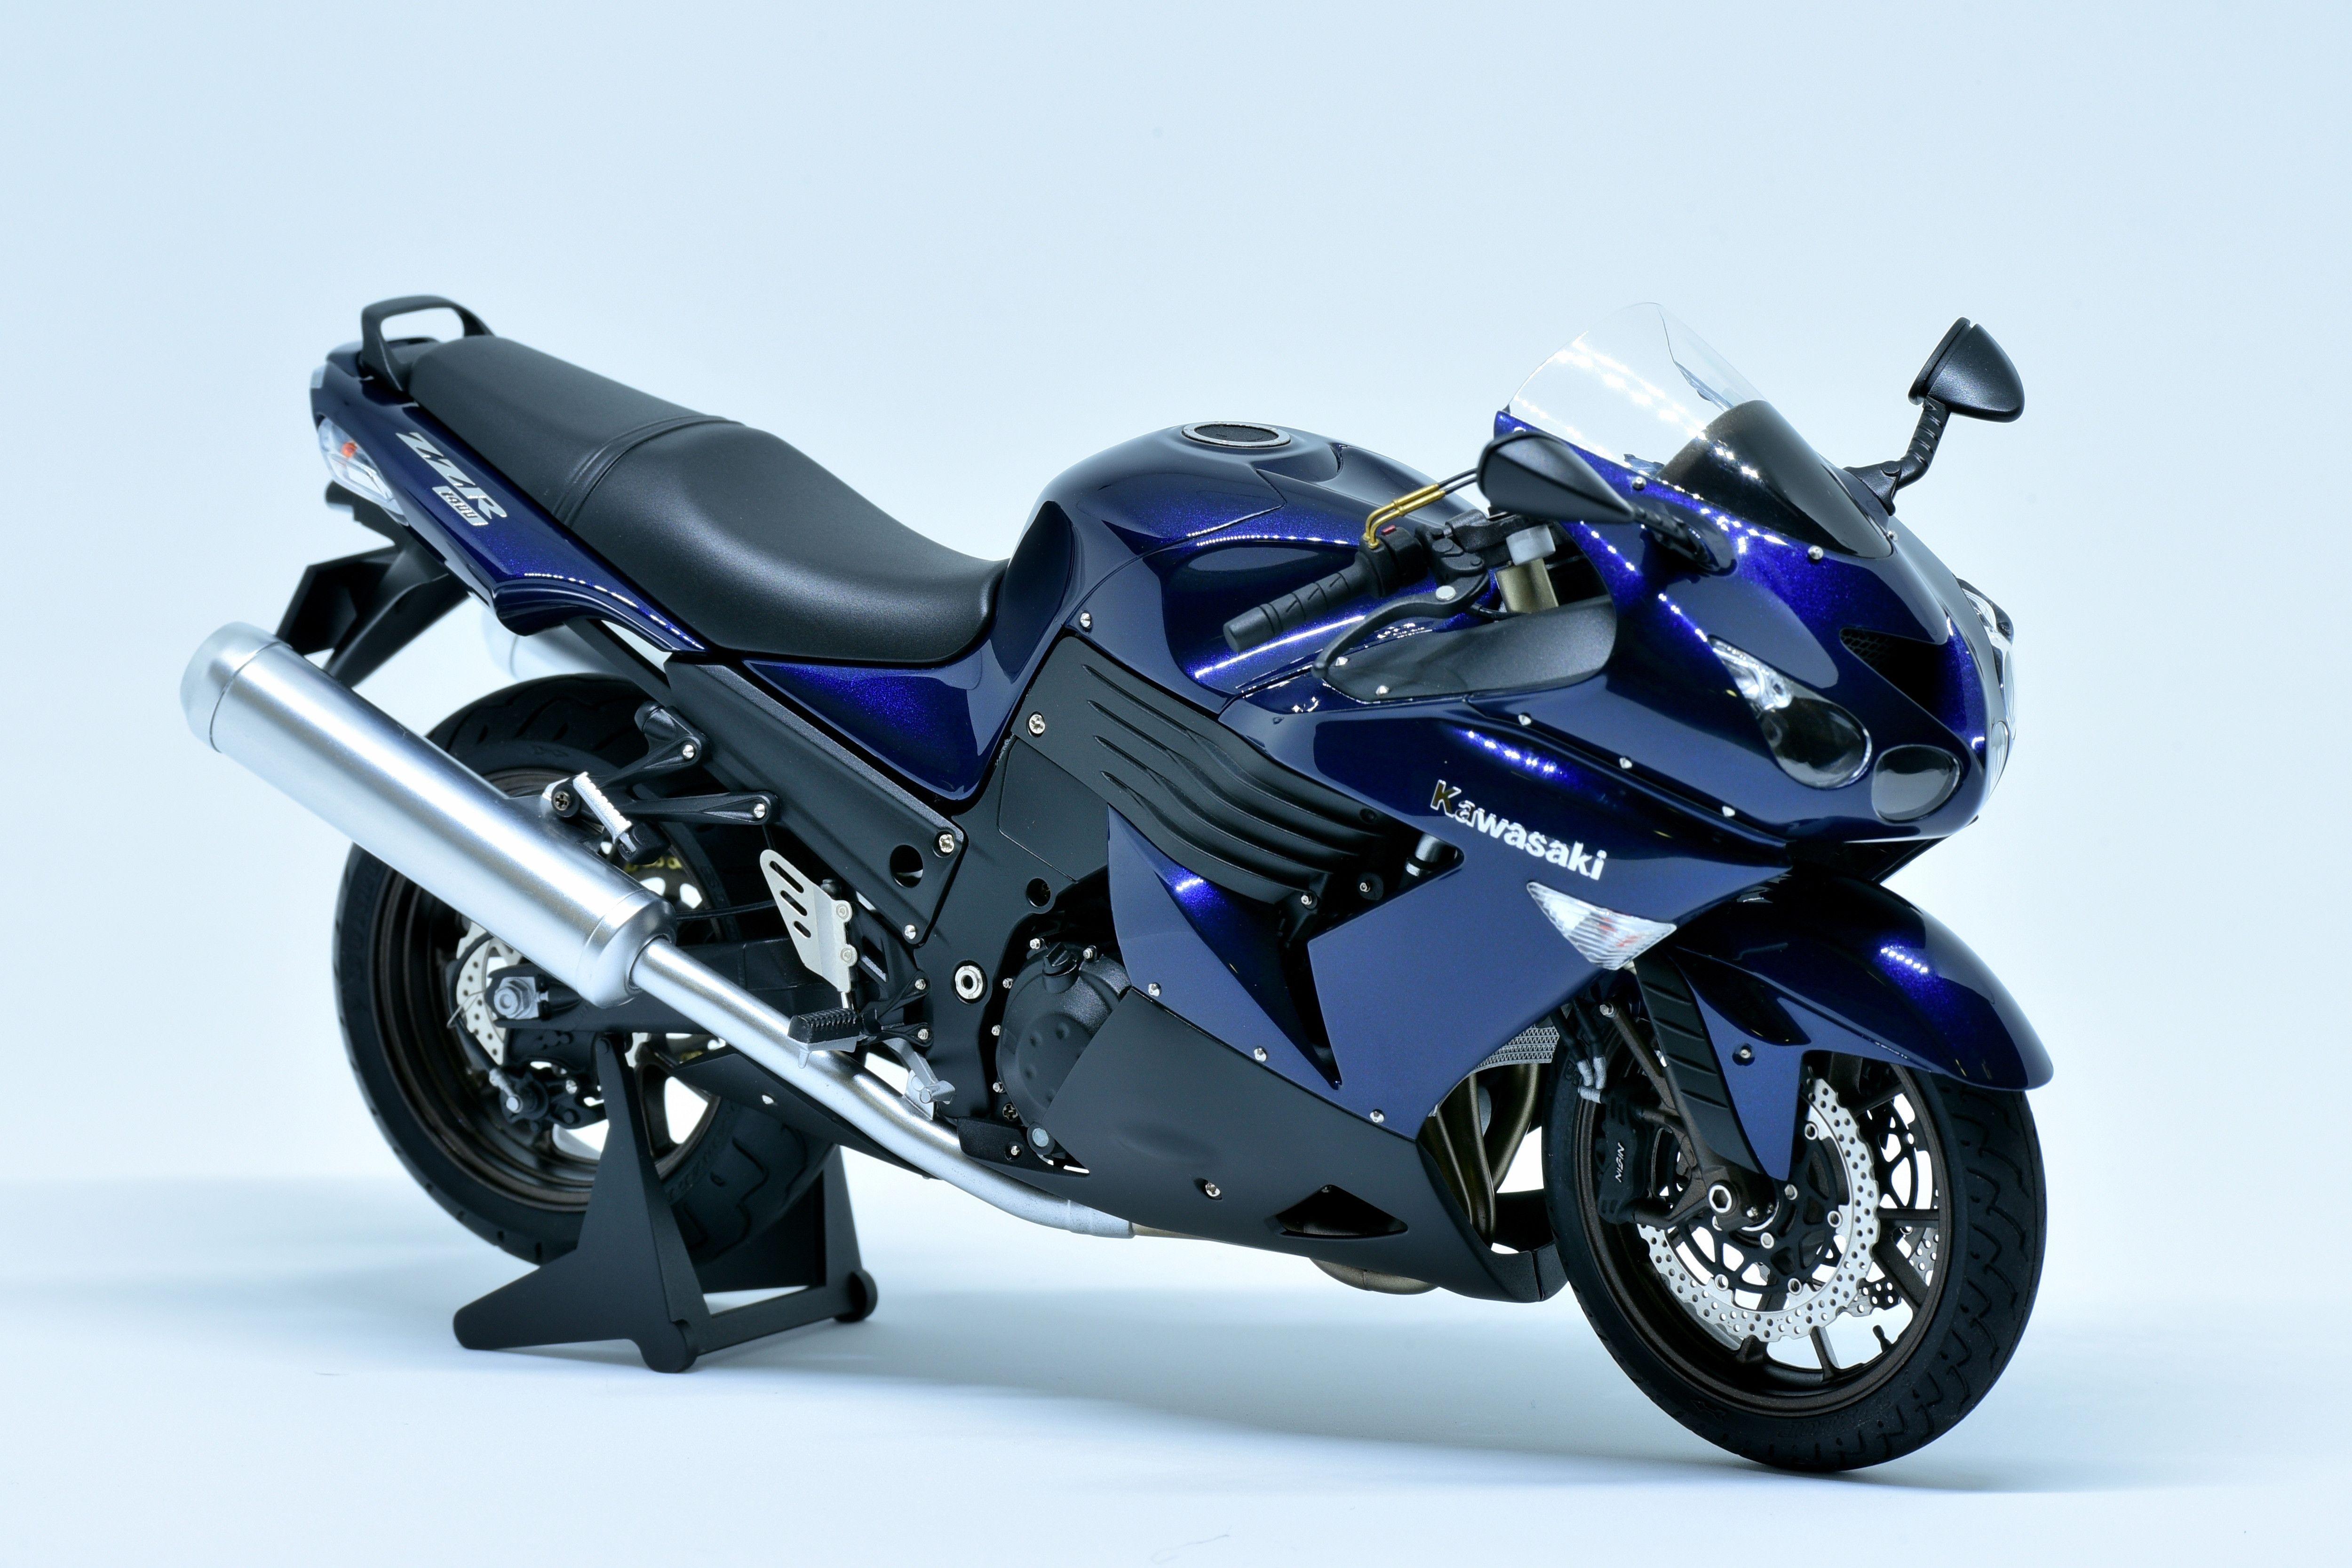 1 12 Kawasaki Zzr 1400 Motorsiklet